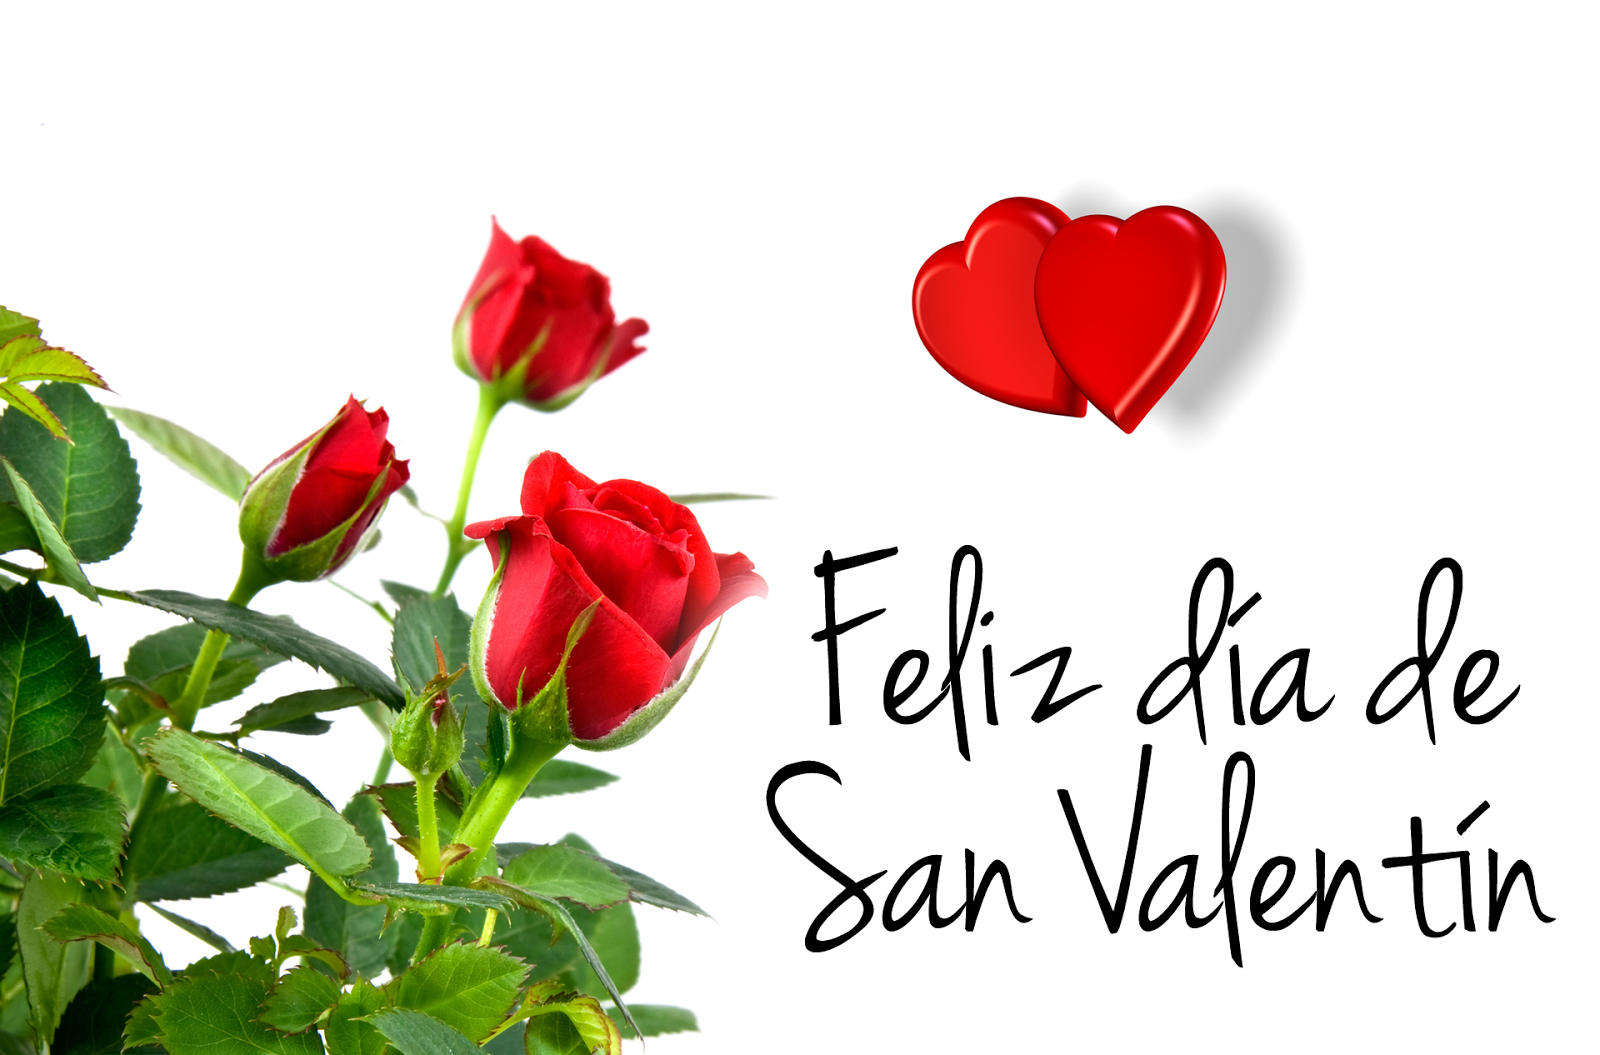 Frases Bonitas Para Facebook Feliz Dia De San Valentin